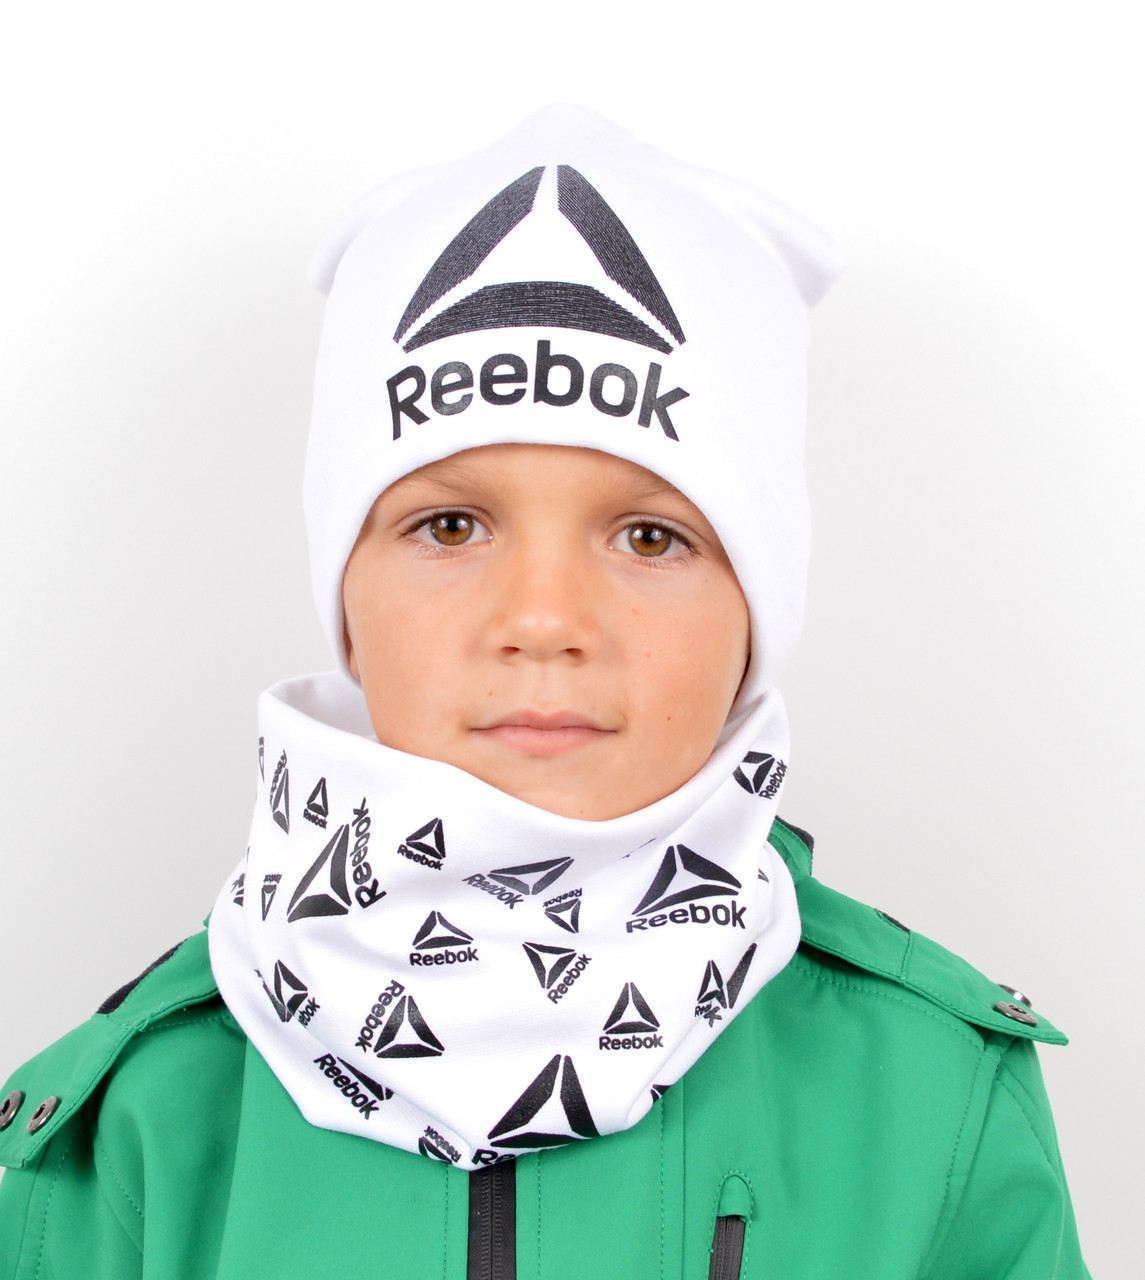 Трикотажный комплект Reebok шапка+хомут, фото 1